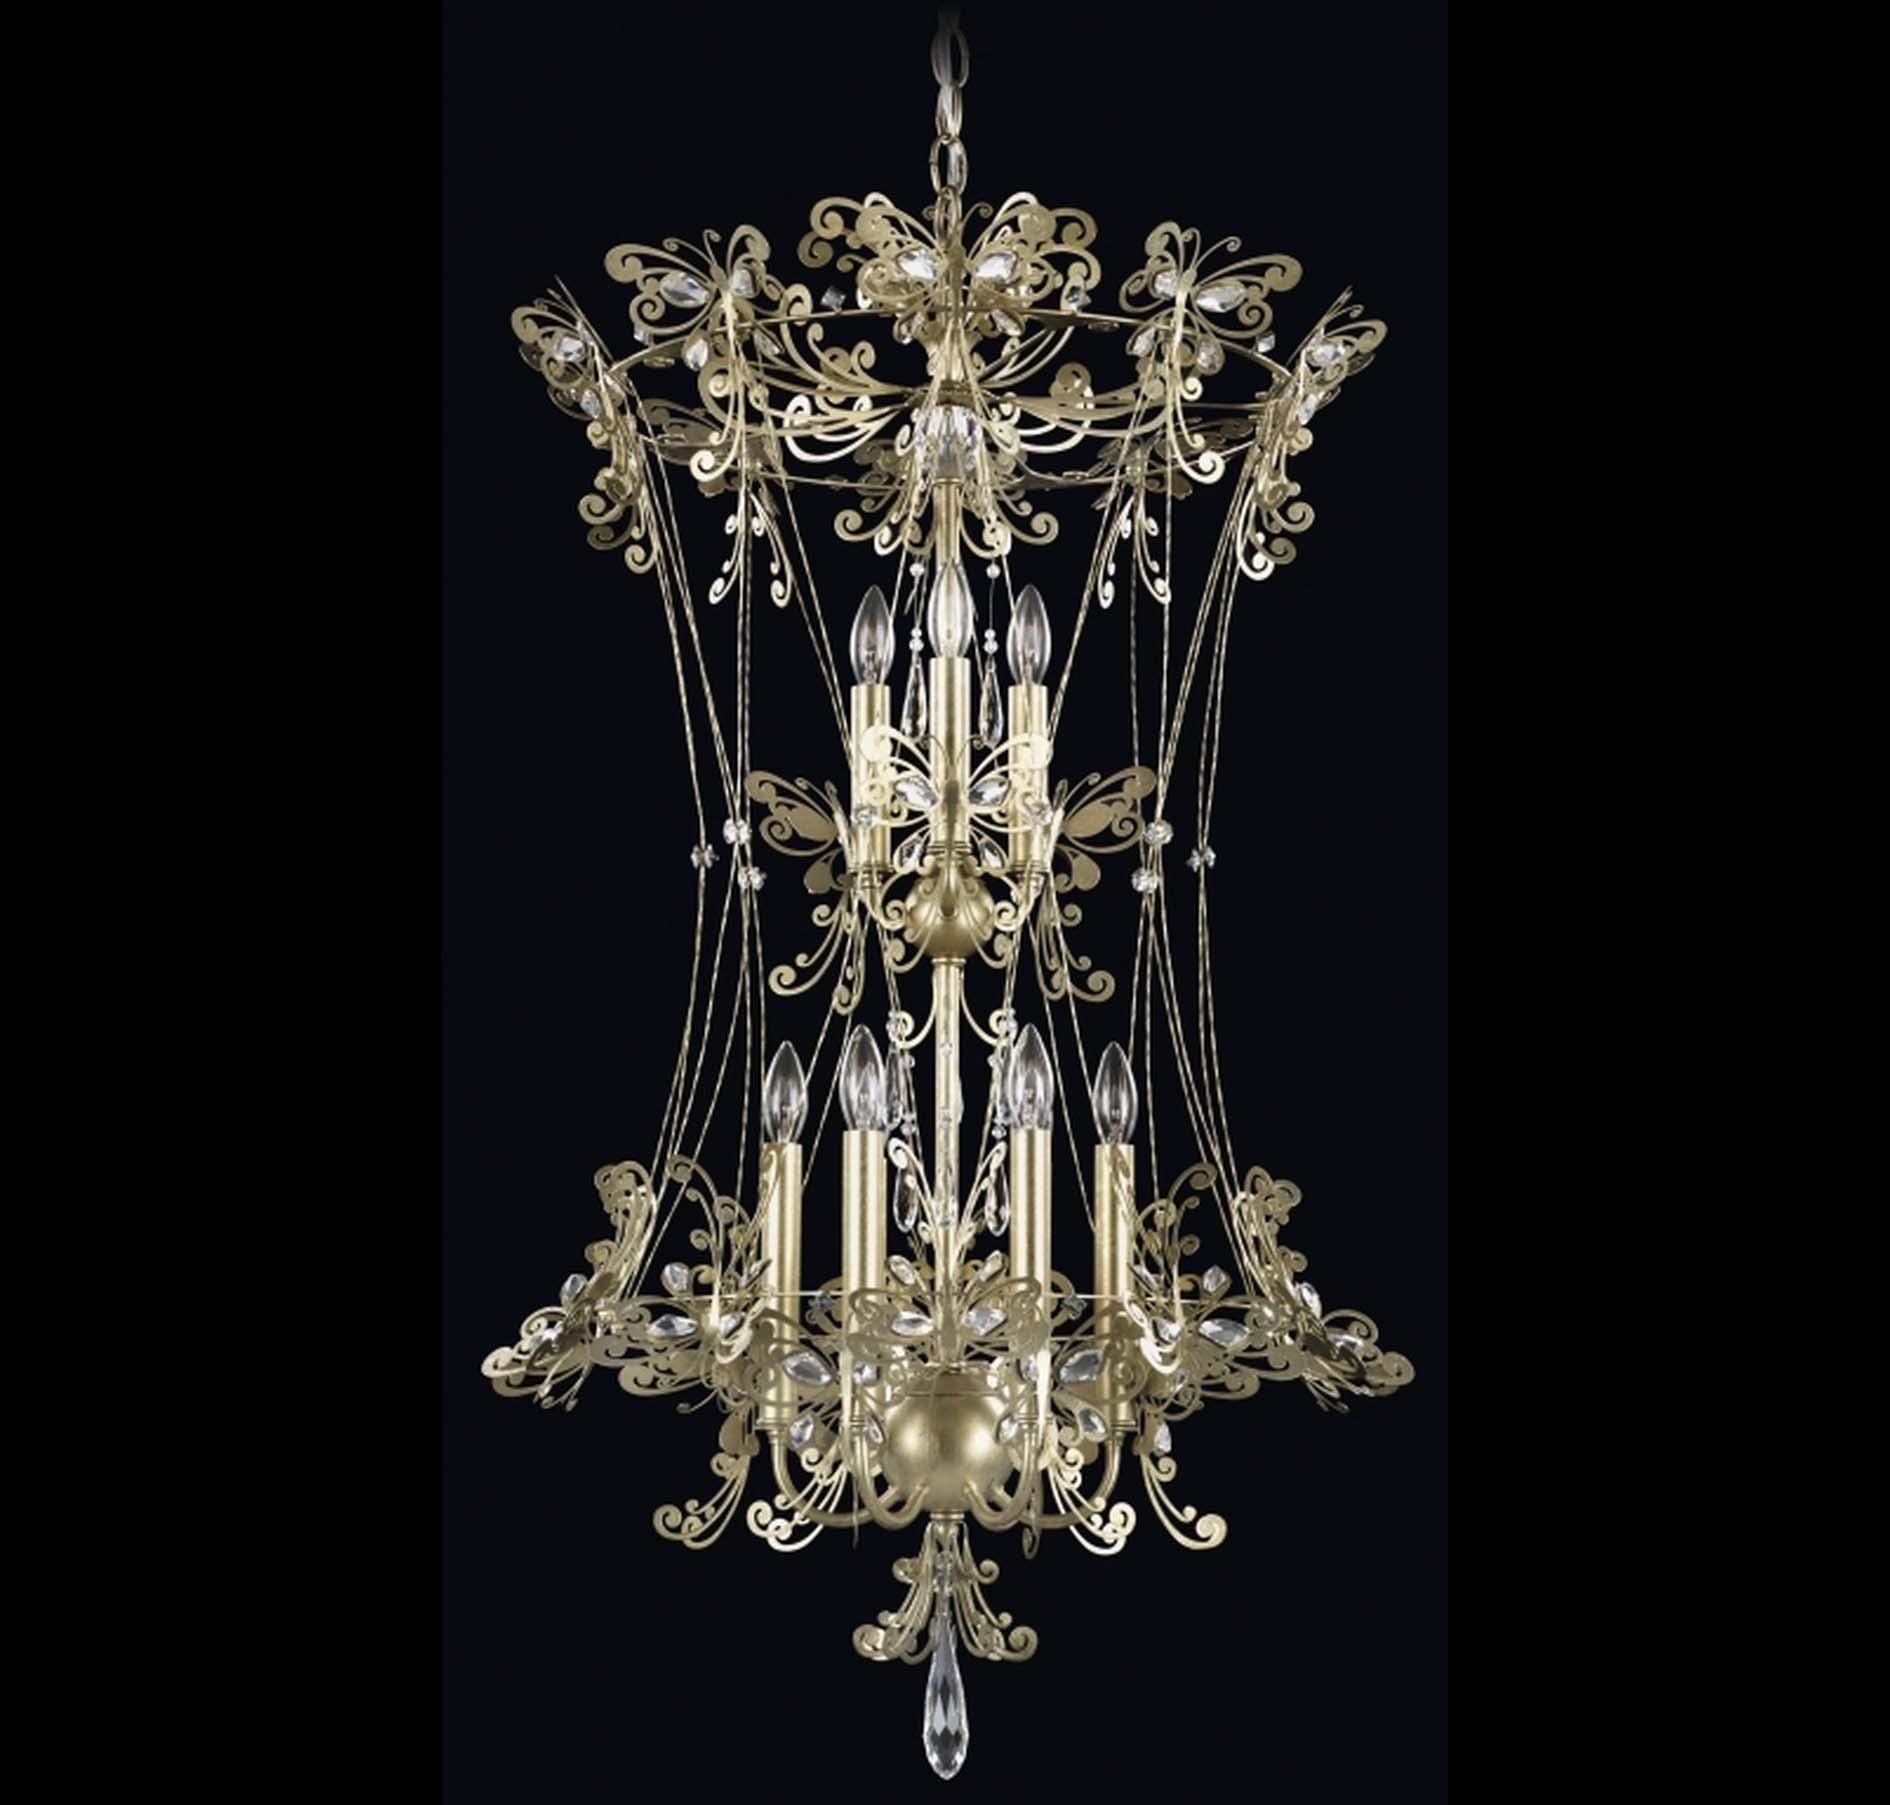 swarovski crystal chandelier HOME☆CHANDELIER ♧